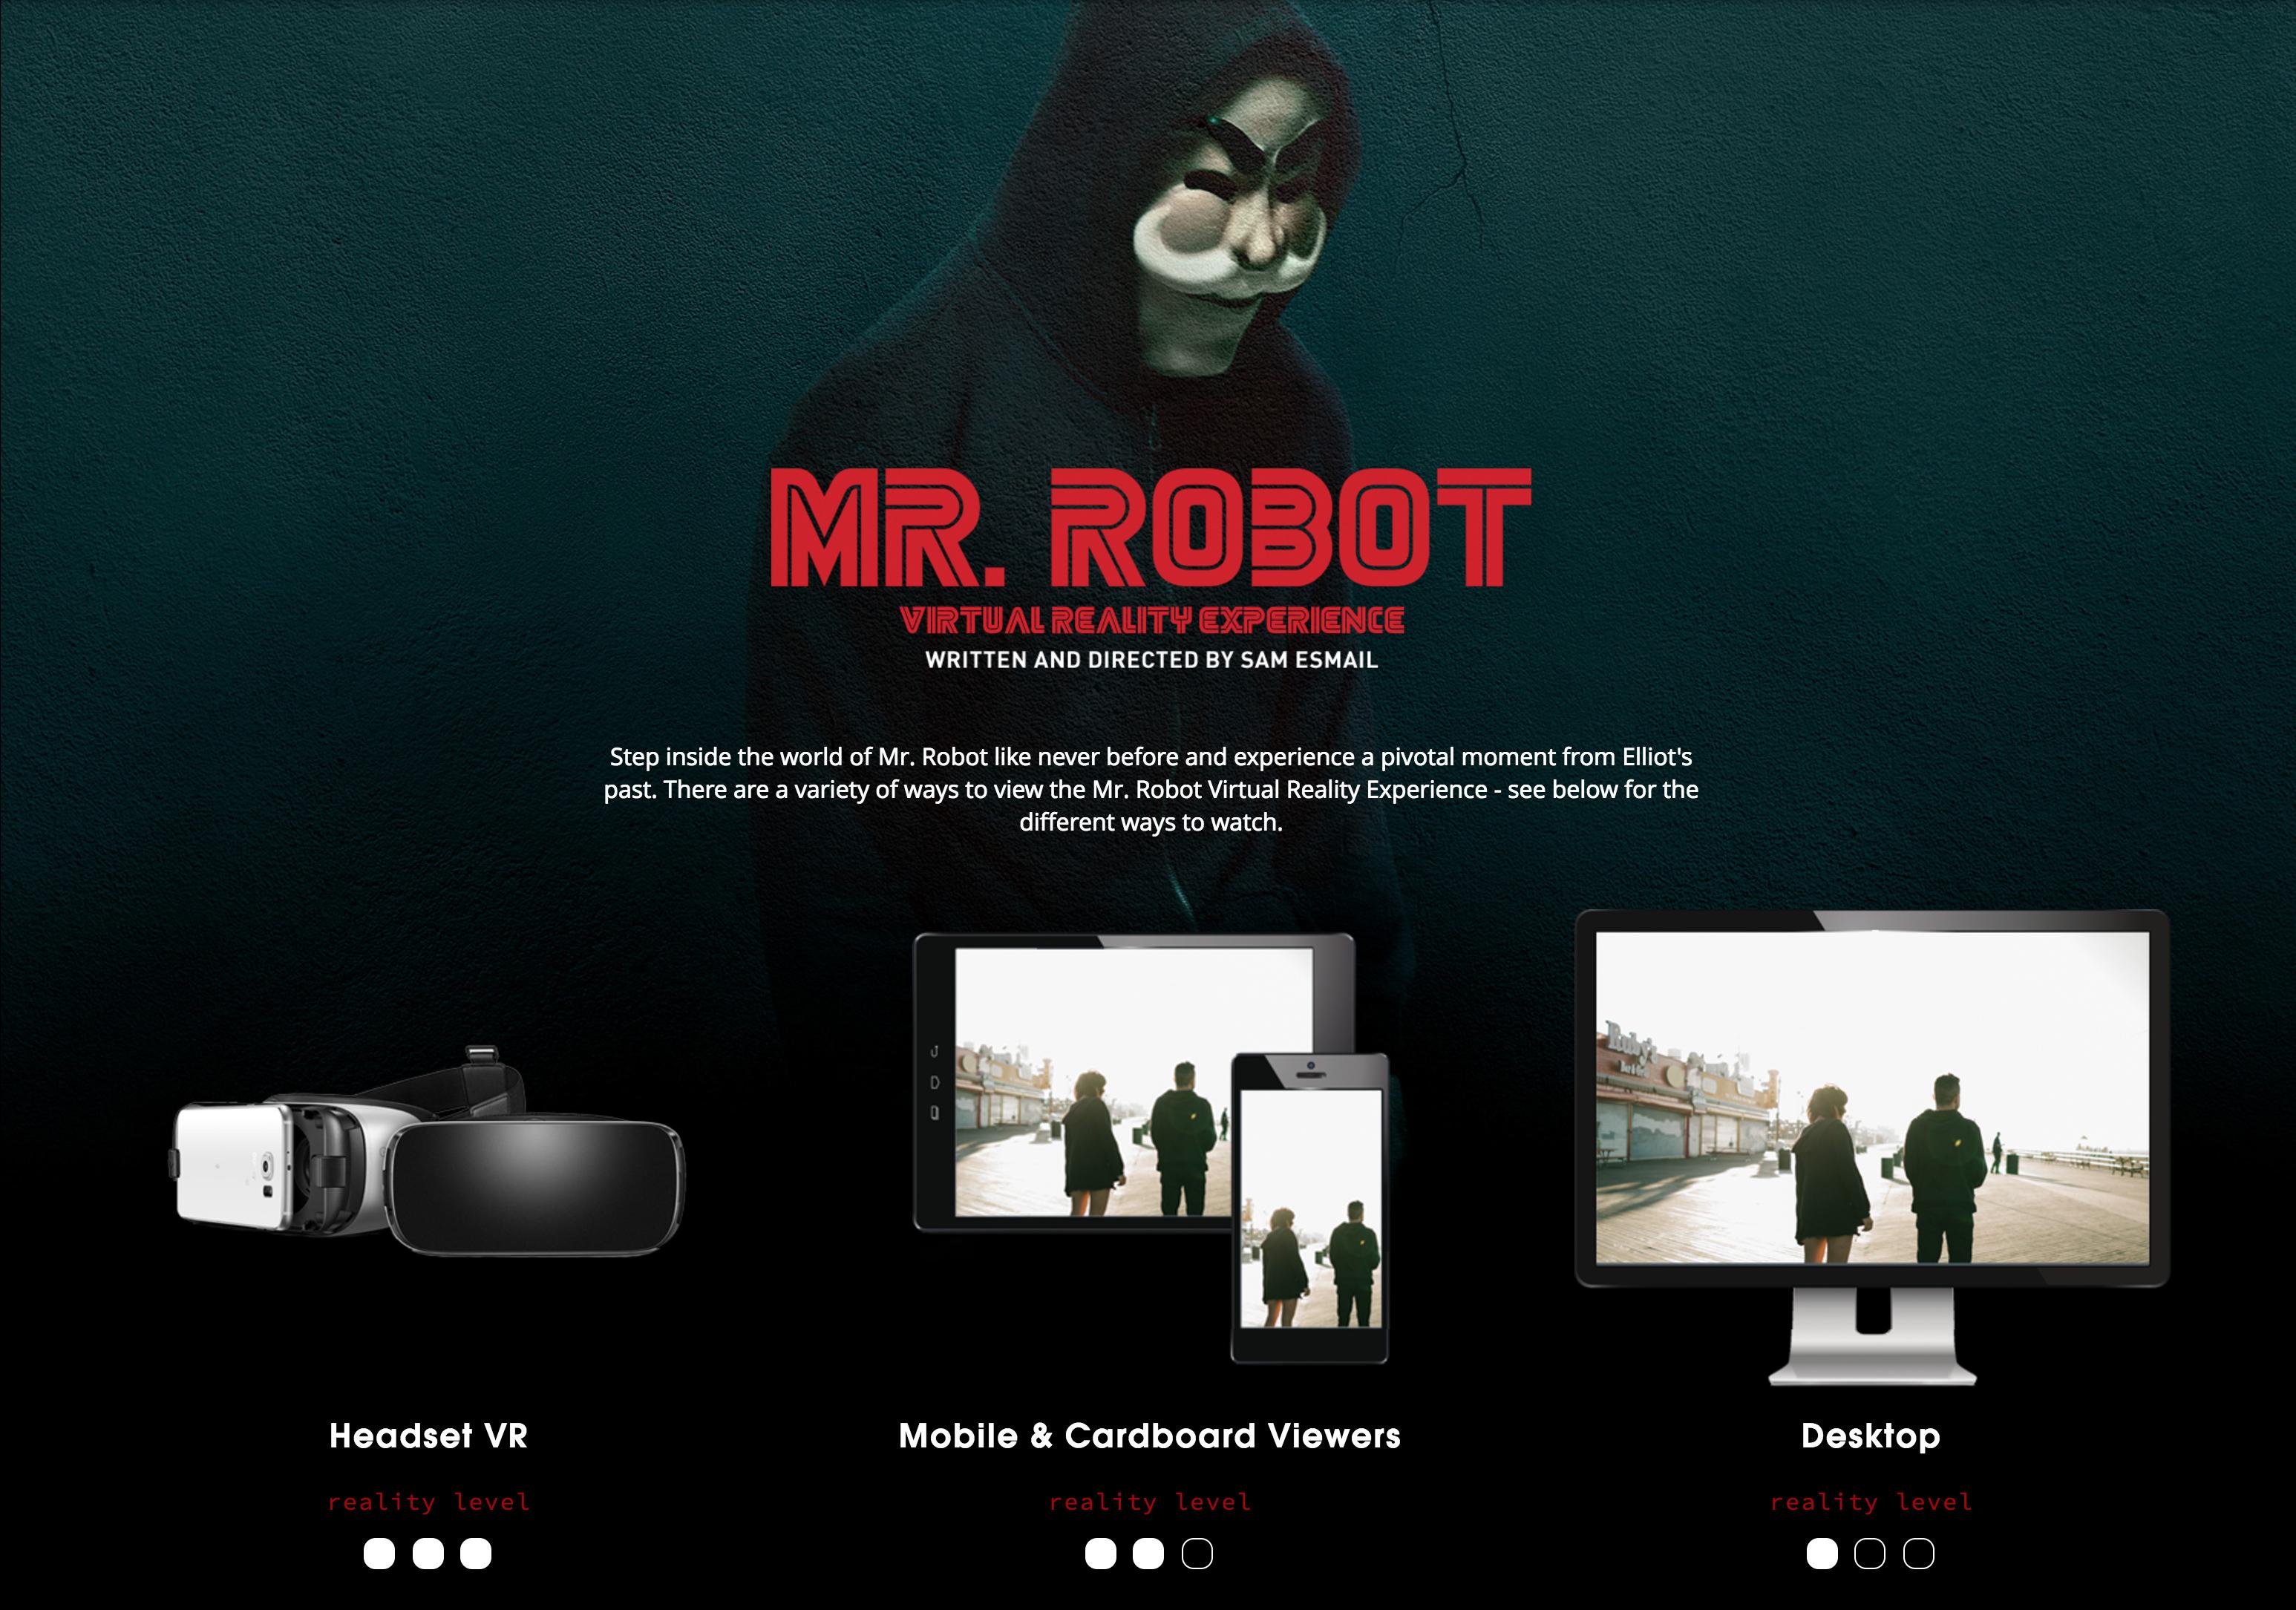 The Mr. Robot Virtual Reality Experience Thumbnail